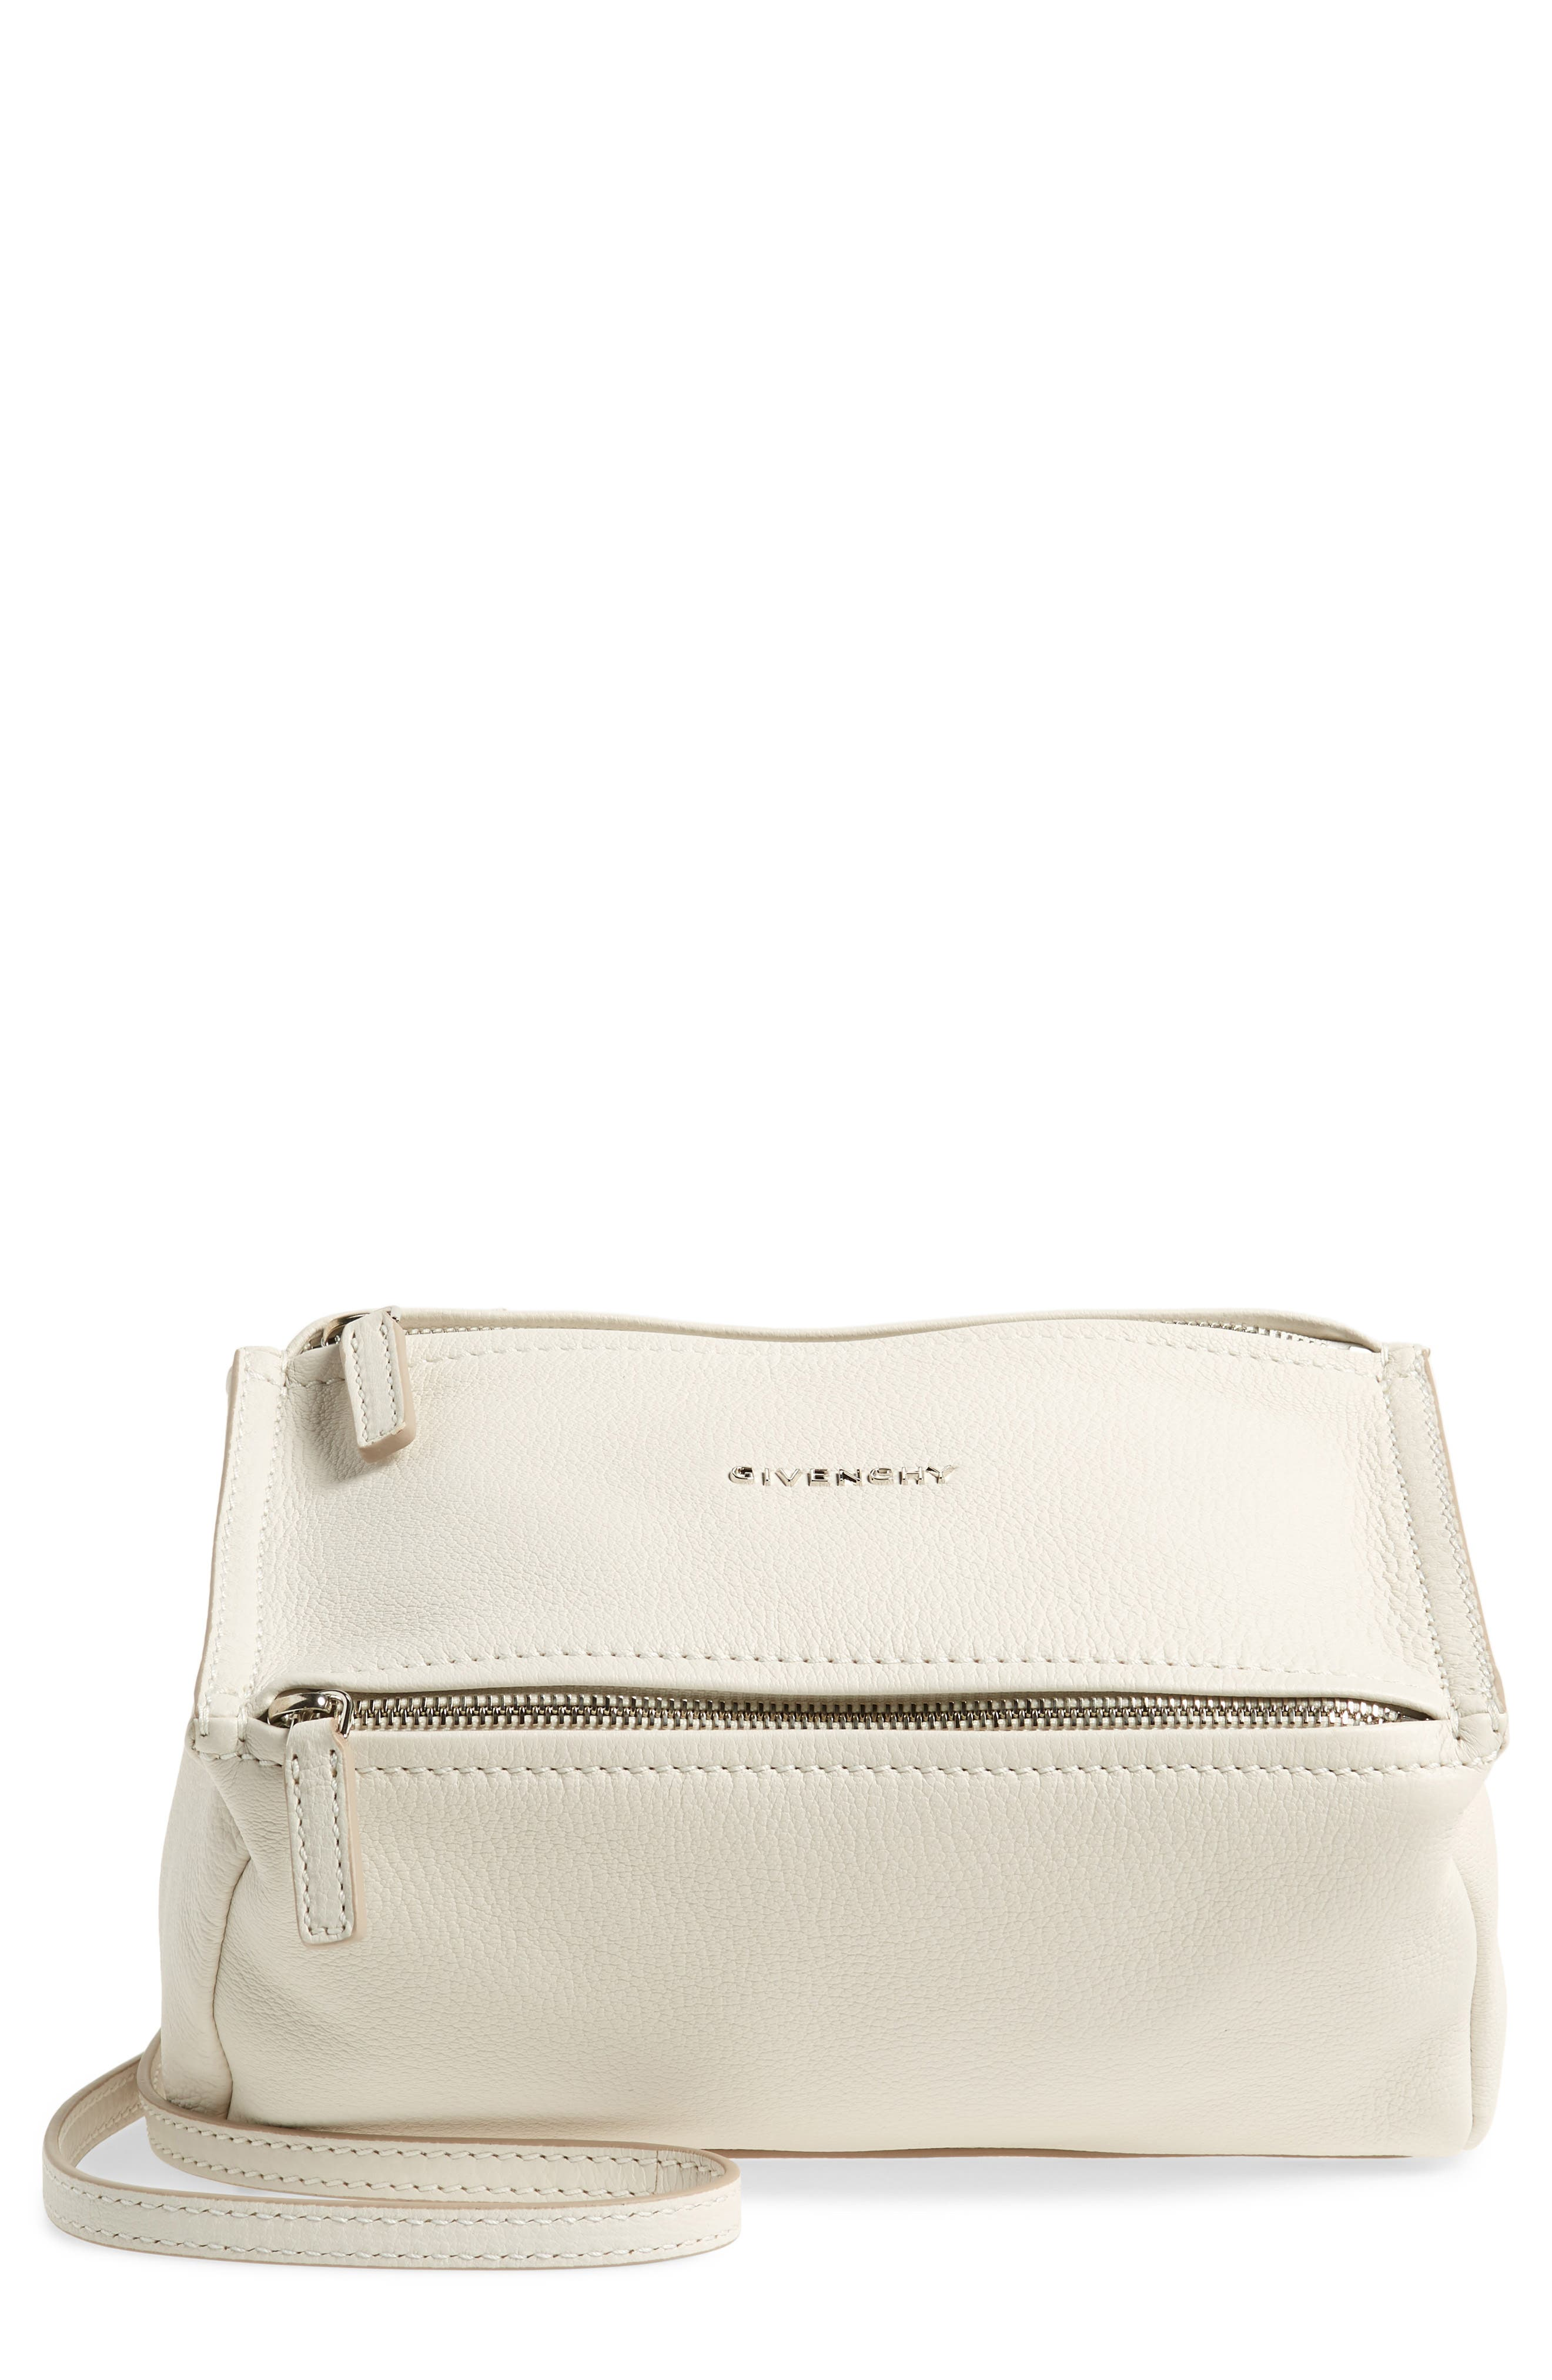 'Mini Pandora' Sugar Leather Shoulder Bag,                             Main thumbnail 1, color,                             WHITE